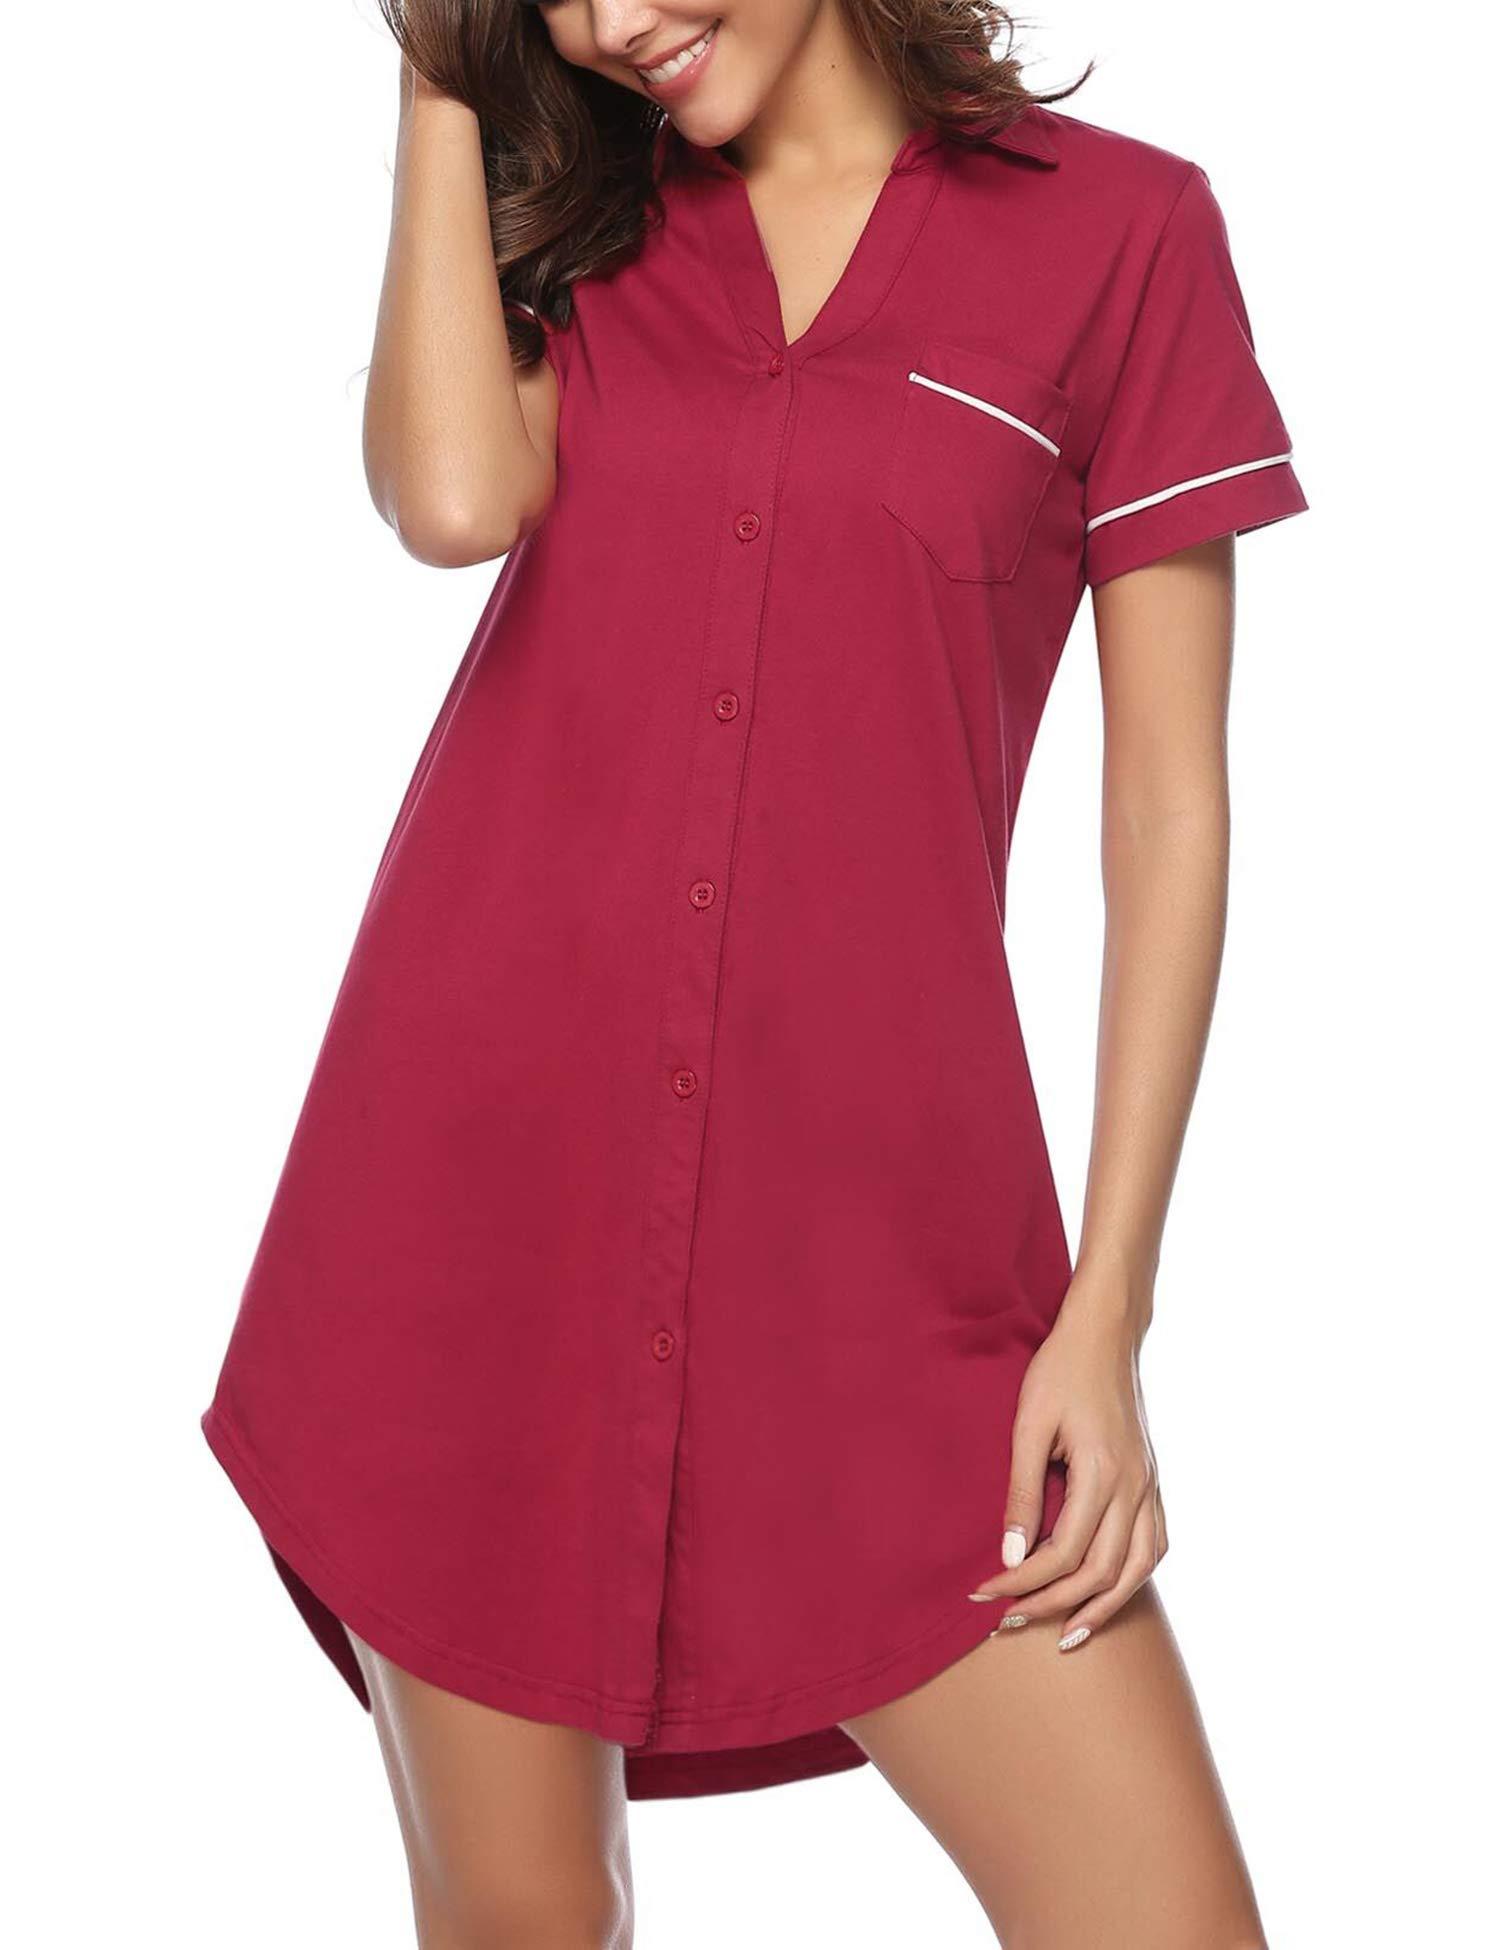 Hawiton Women V Neck Nightshirt Short Sleeve Nightgown Button Front Pajamas Dress Shirts (Cotton-Red, Medium)